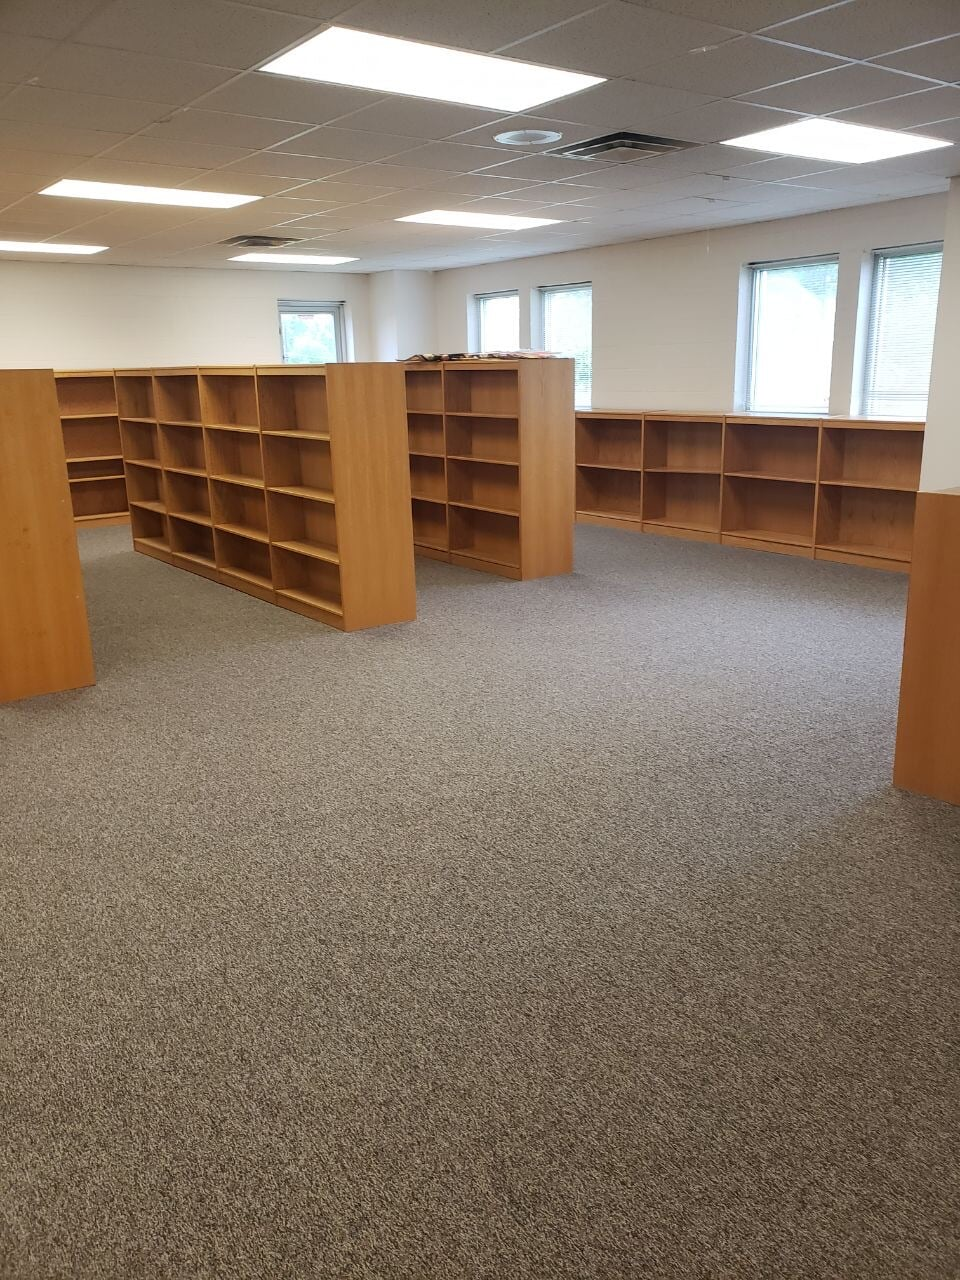 Library carpet flooring in Hendersonville, TN from Absolute Flooring Inc